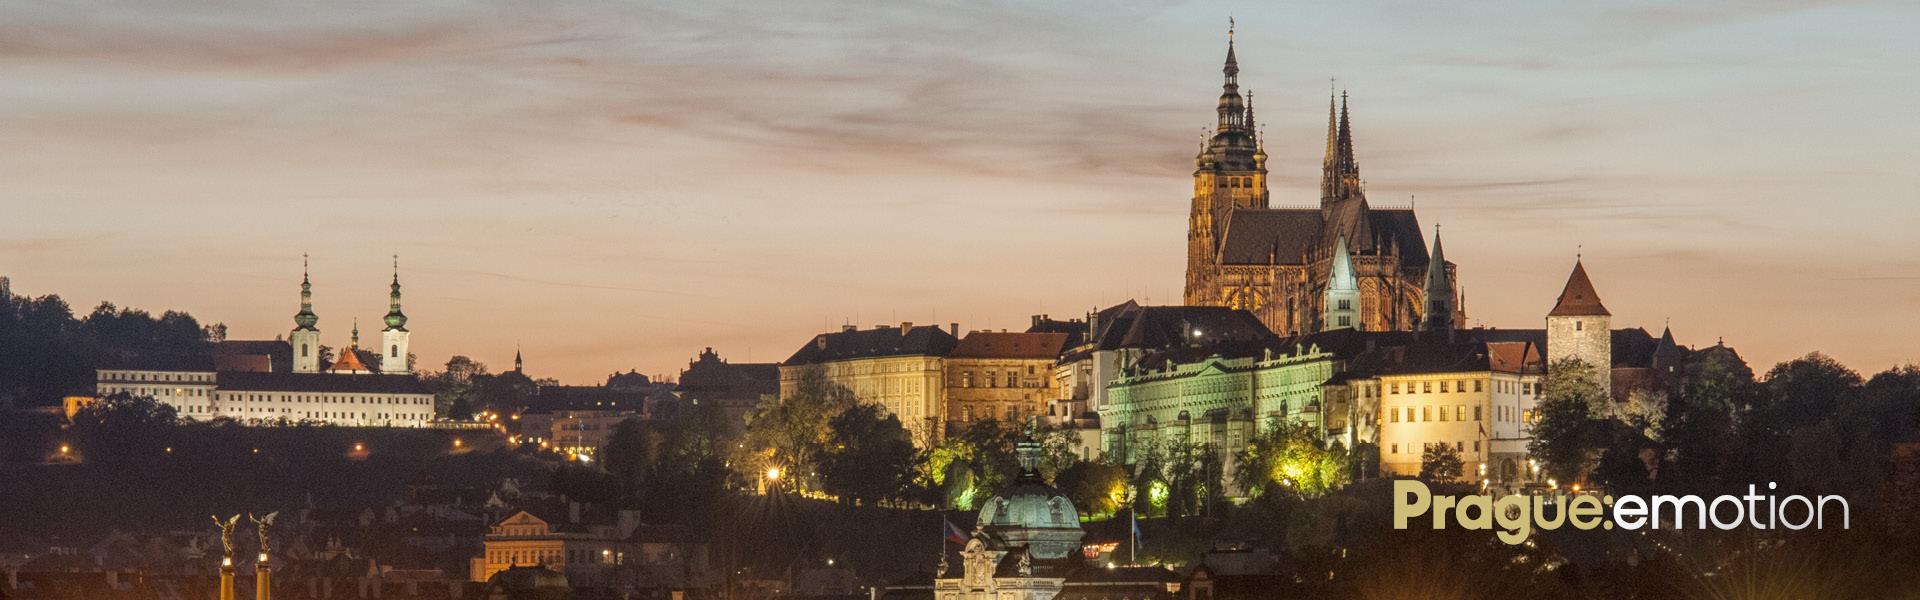 Frauen in Prag abholen